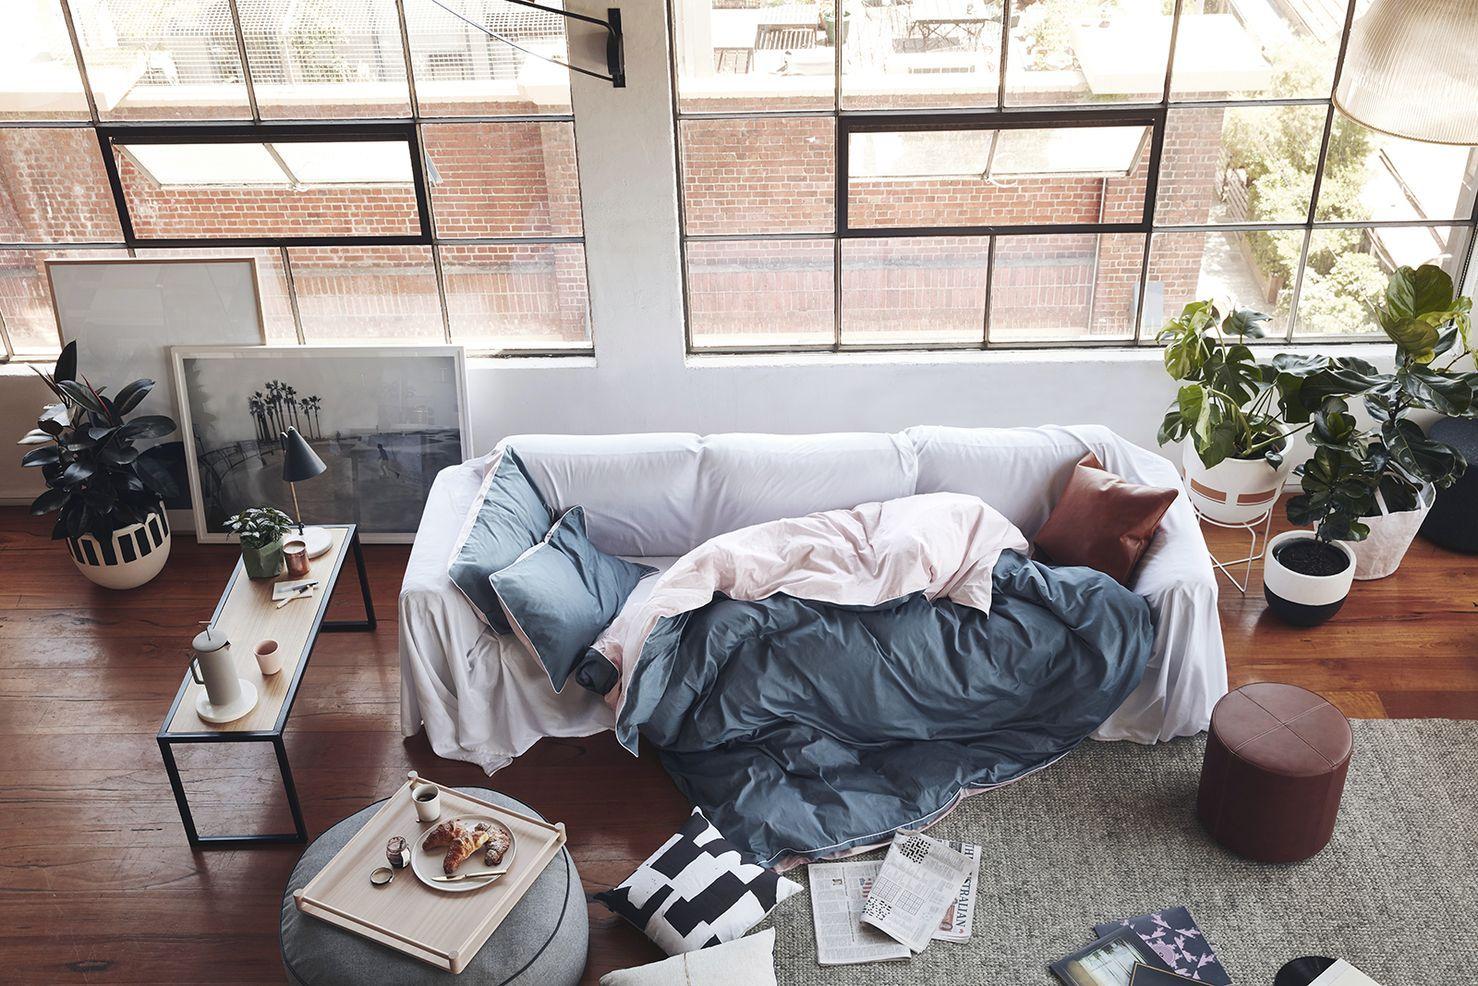 диван спальное место